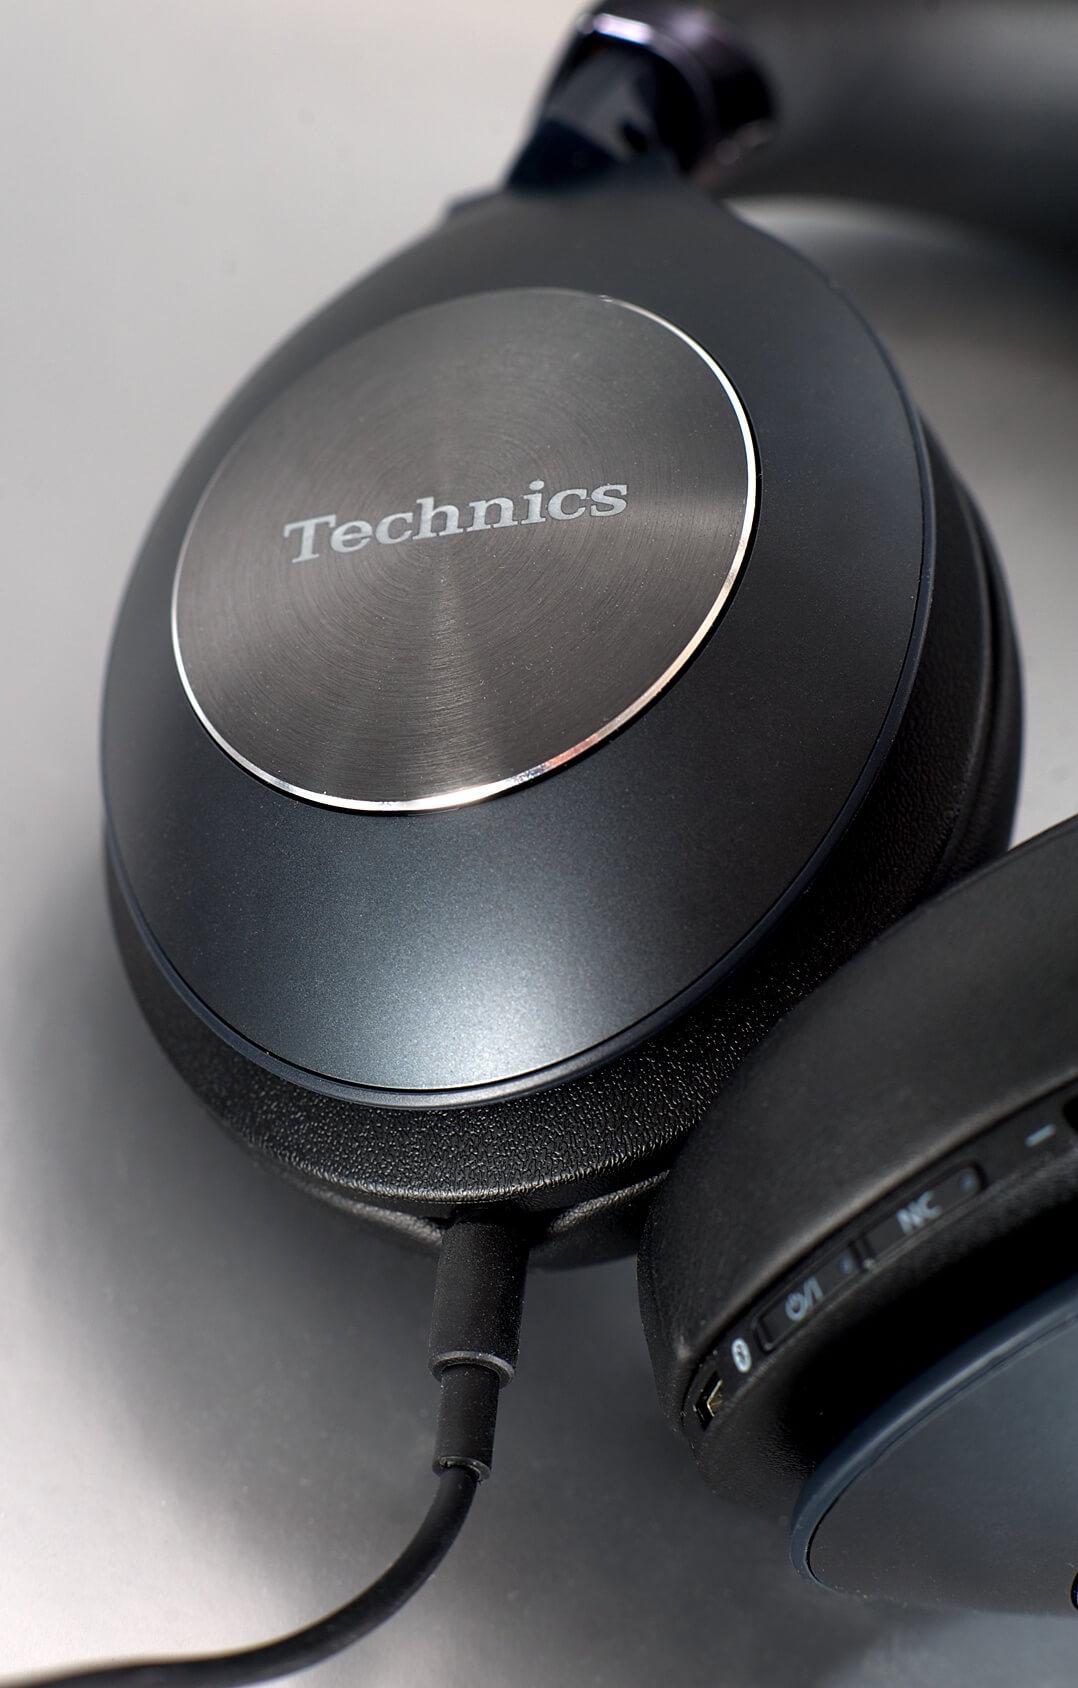 Hörmuschel des Technics F70N